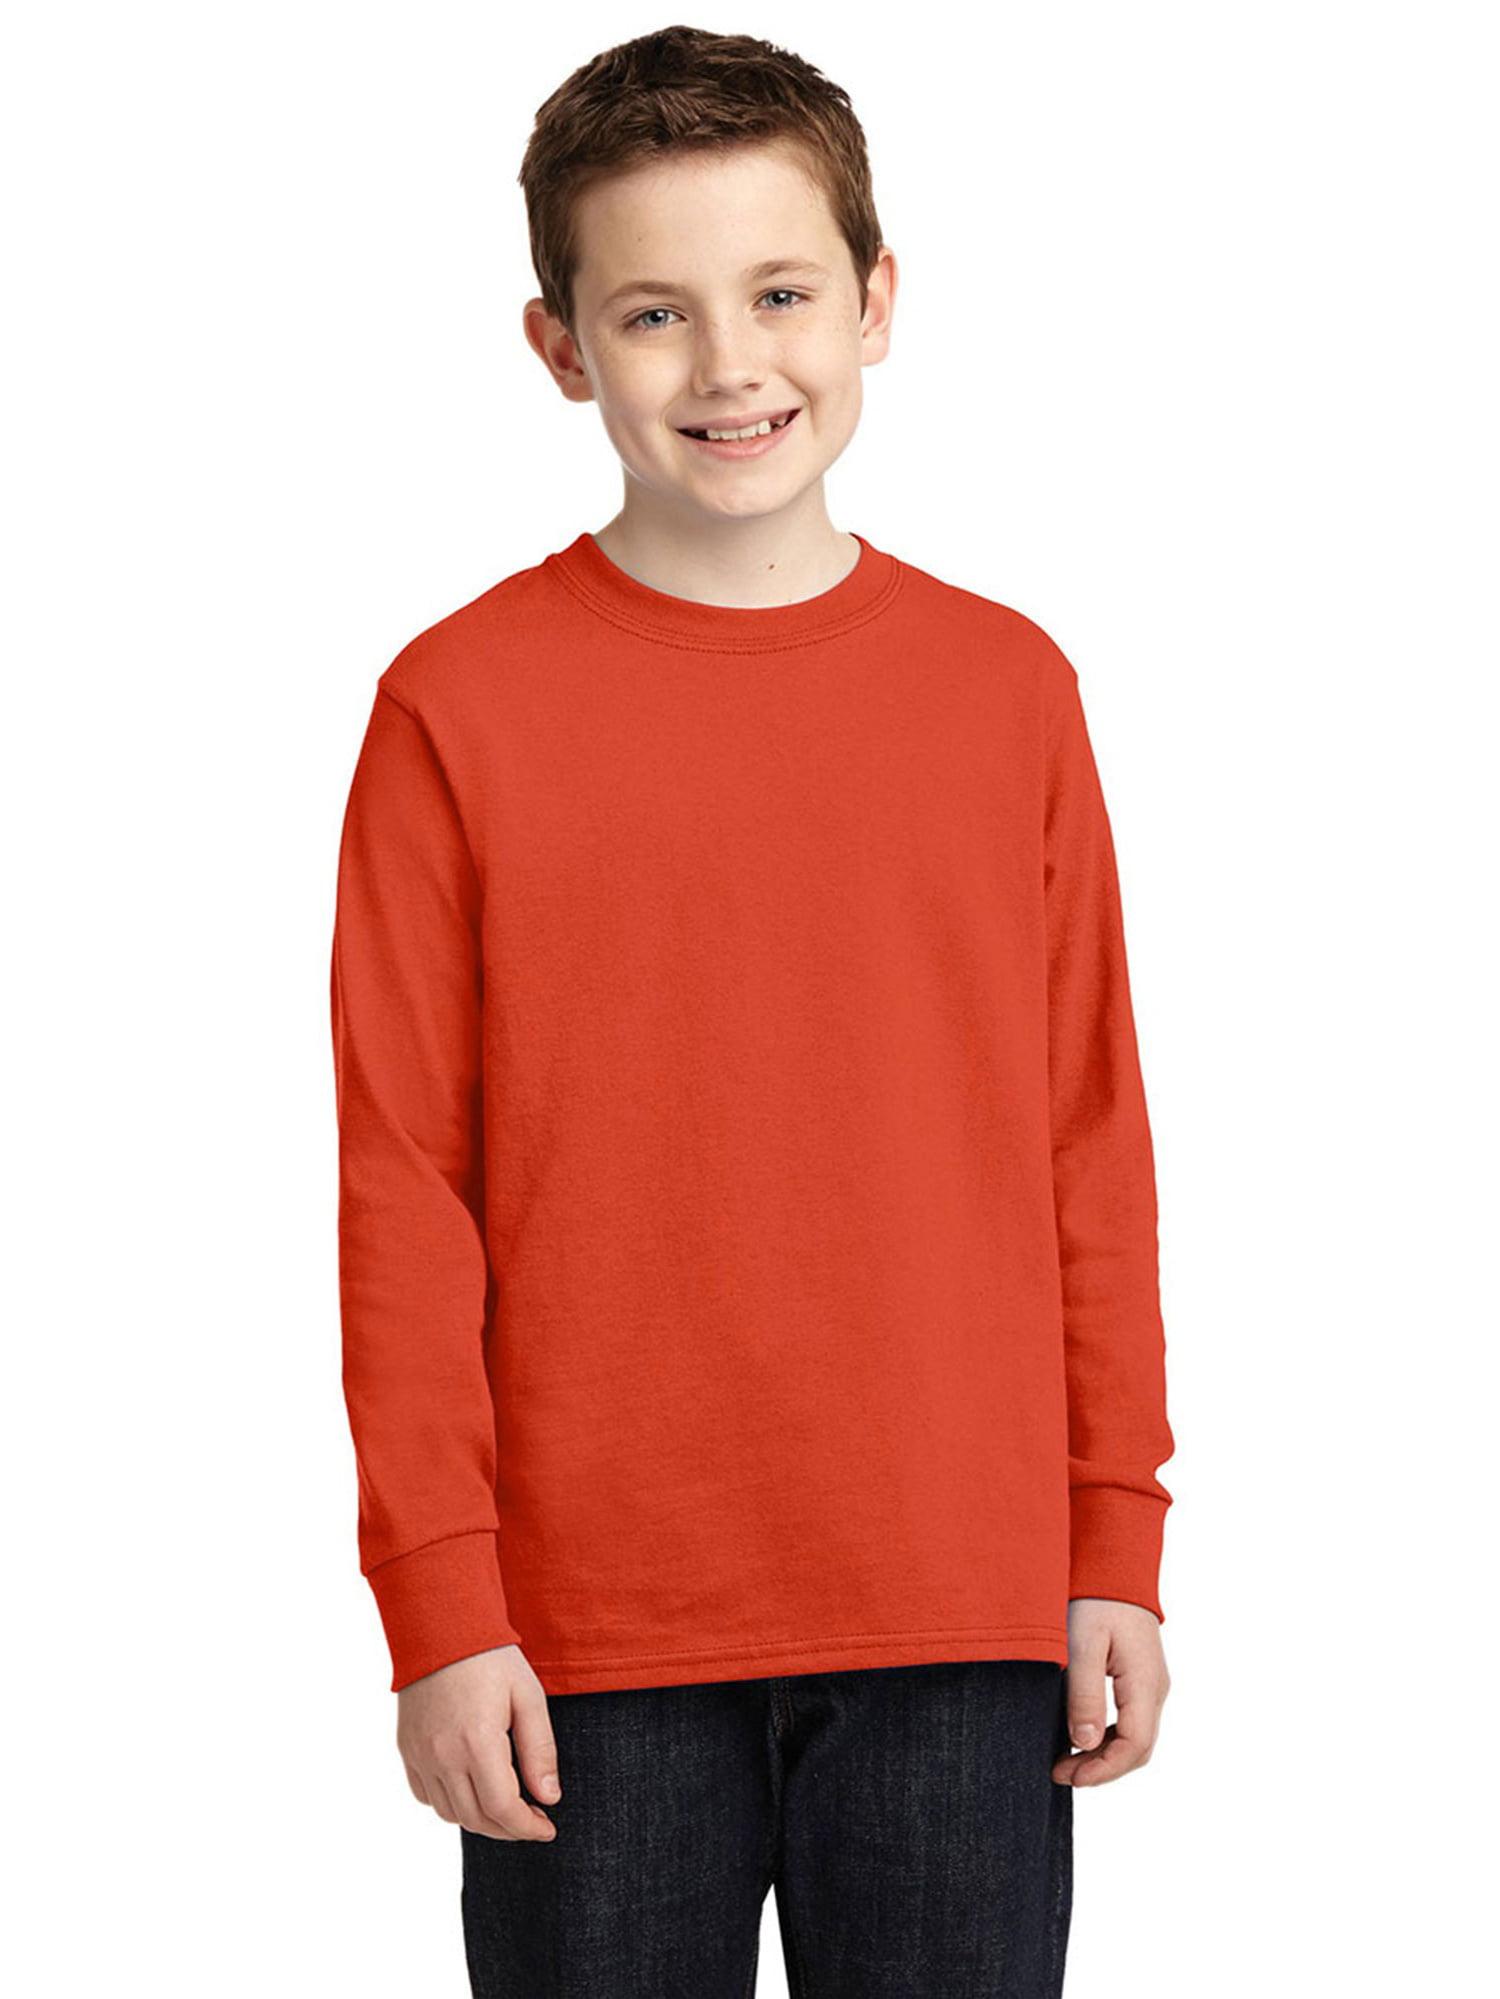 Port & Company Boy'sIndispensable Classic Friendly T Shirt